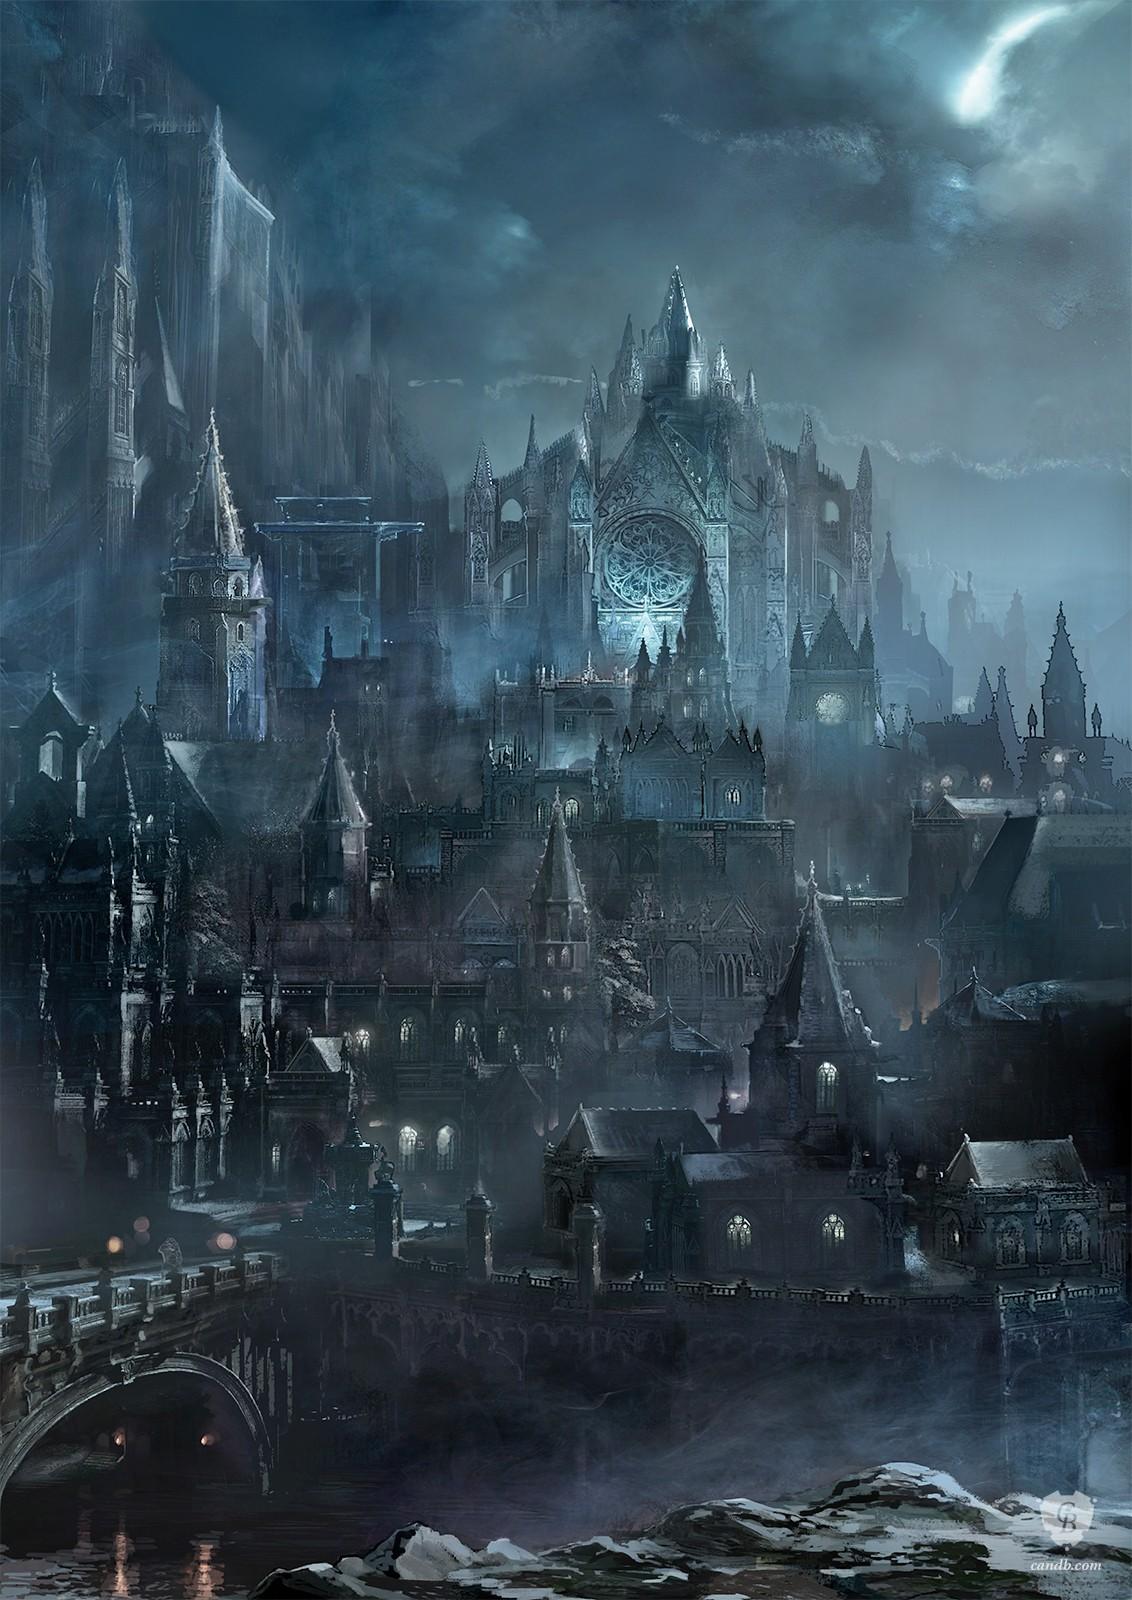 The geeky nerfherder coolart 39 dark souls iii 39 video for Dark souls 3 architecture